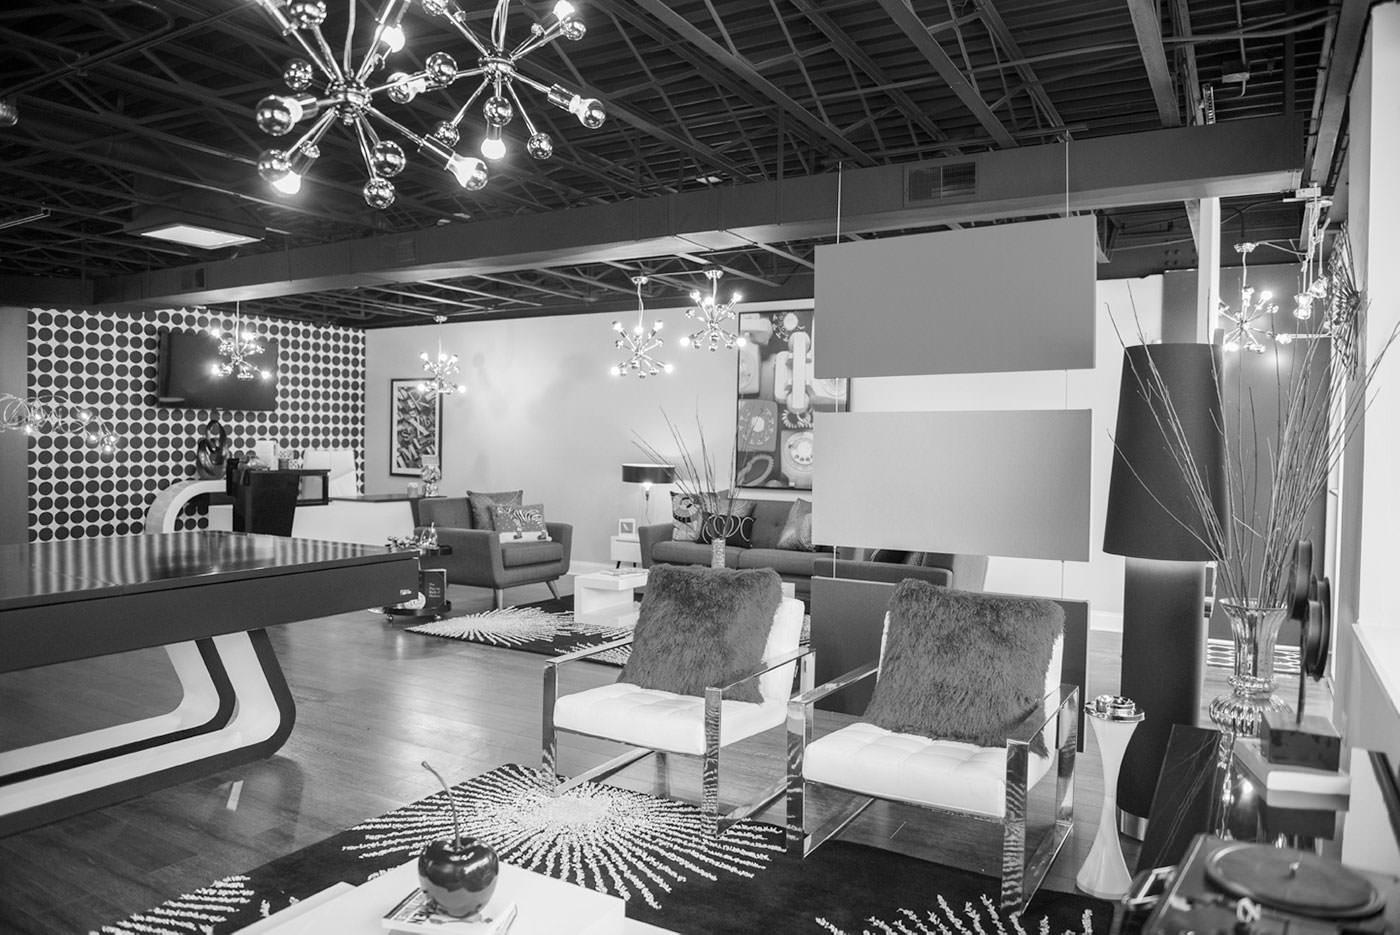 Picture of C Squared Media office interior